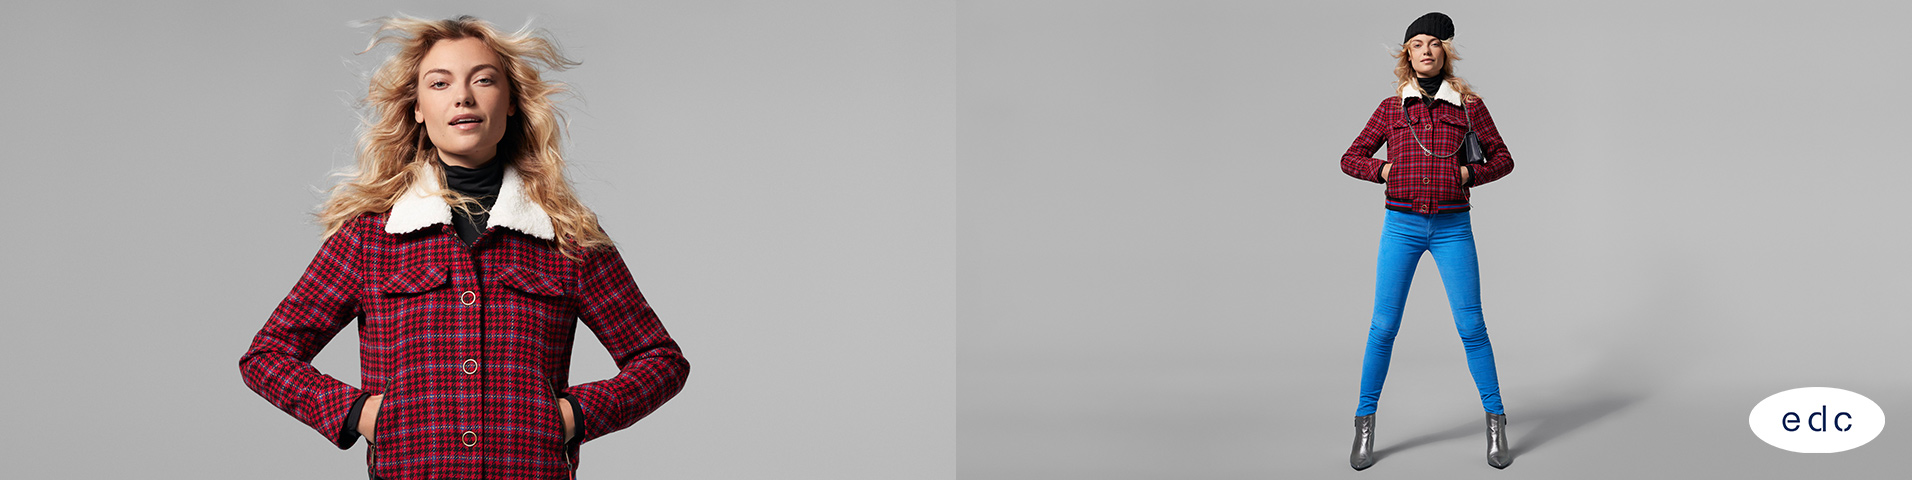 edc by Esprit online shop   Gratis verzending   ZALANDO 1bc38b859a11